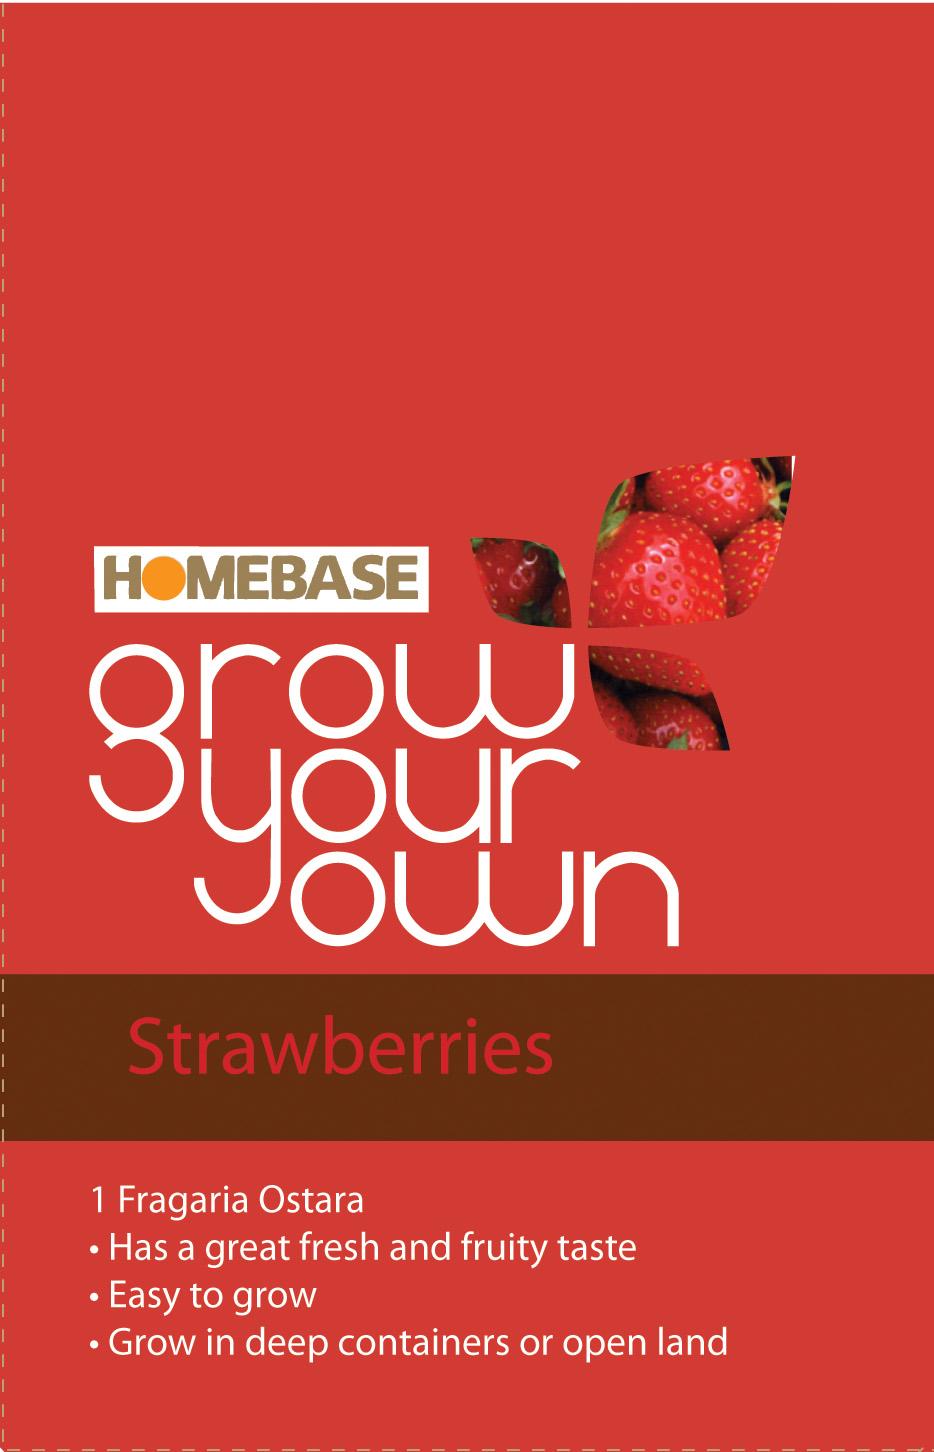 [Strawberry2]